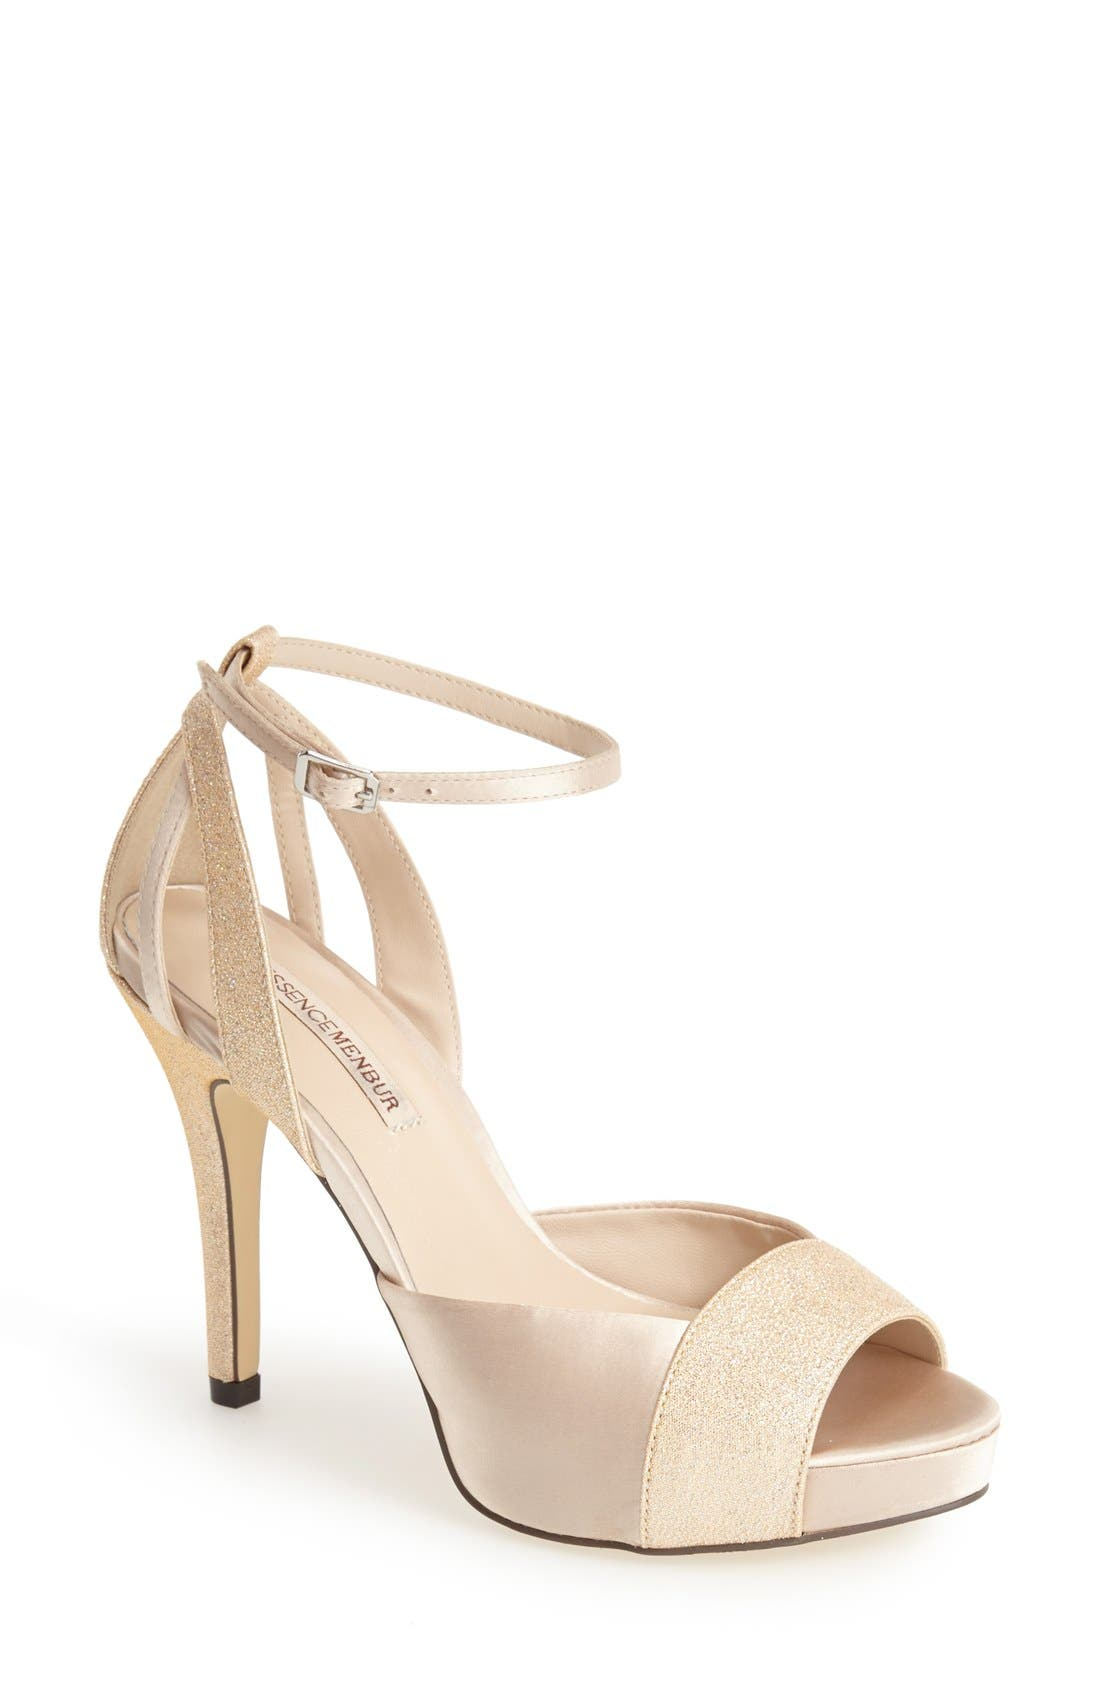 MENBUR 'Arenales' Satin Ankle Strap Sandal